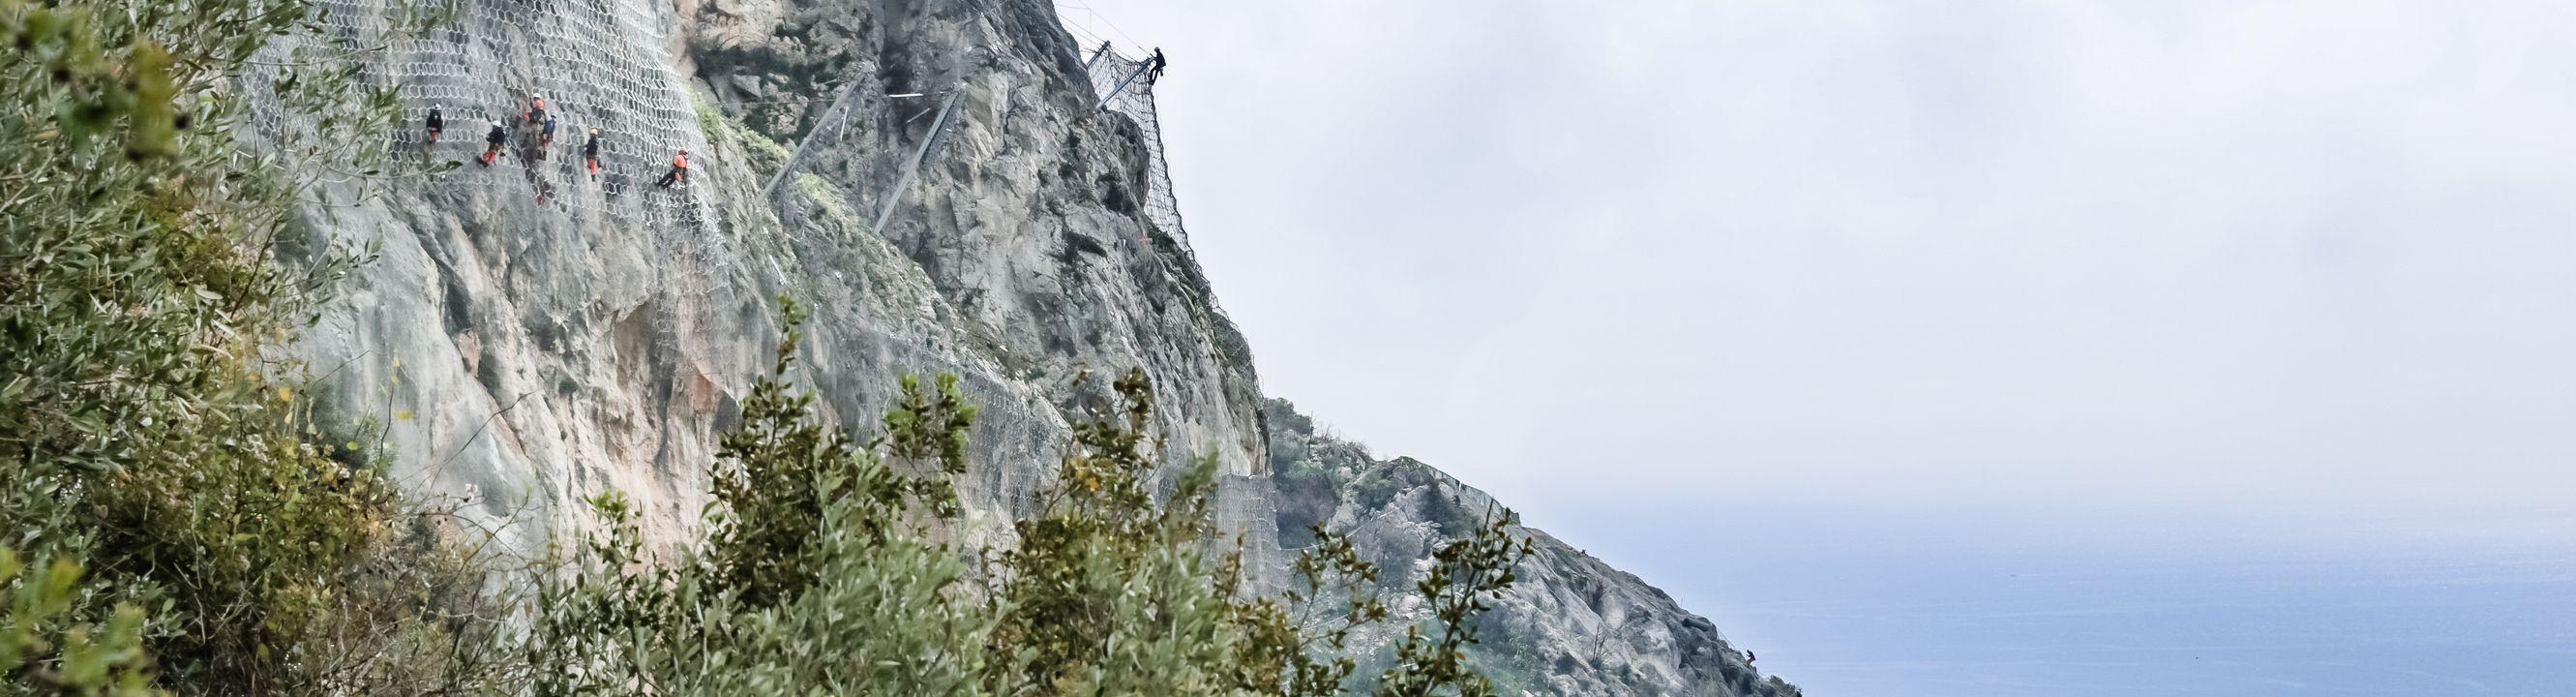 technicien cordiste 06 paca alpes maritimes urbain mission acts patrigeon